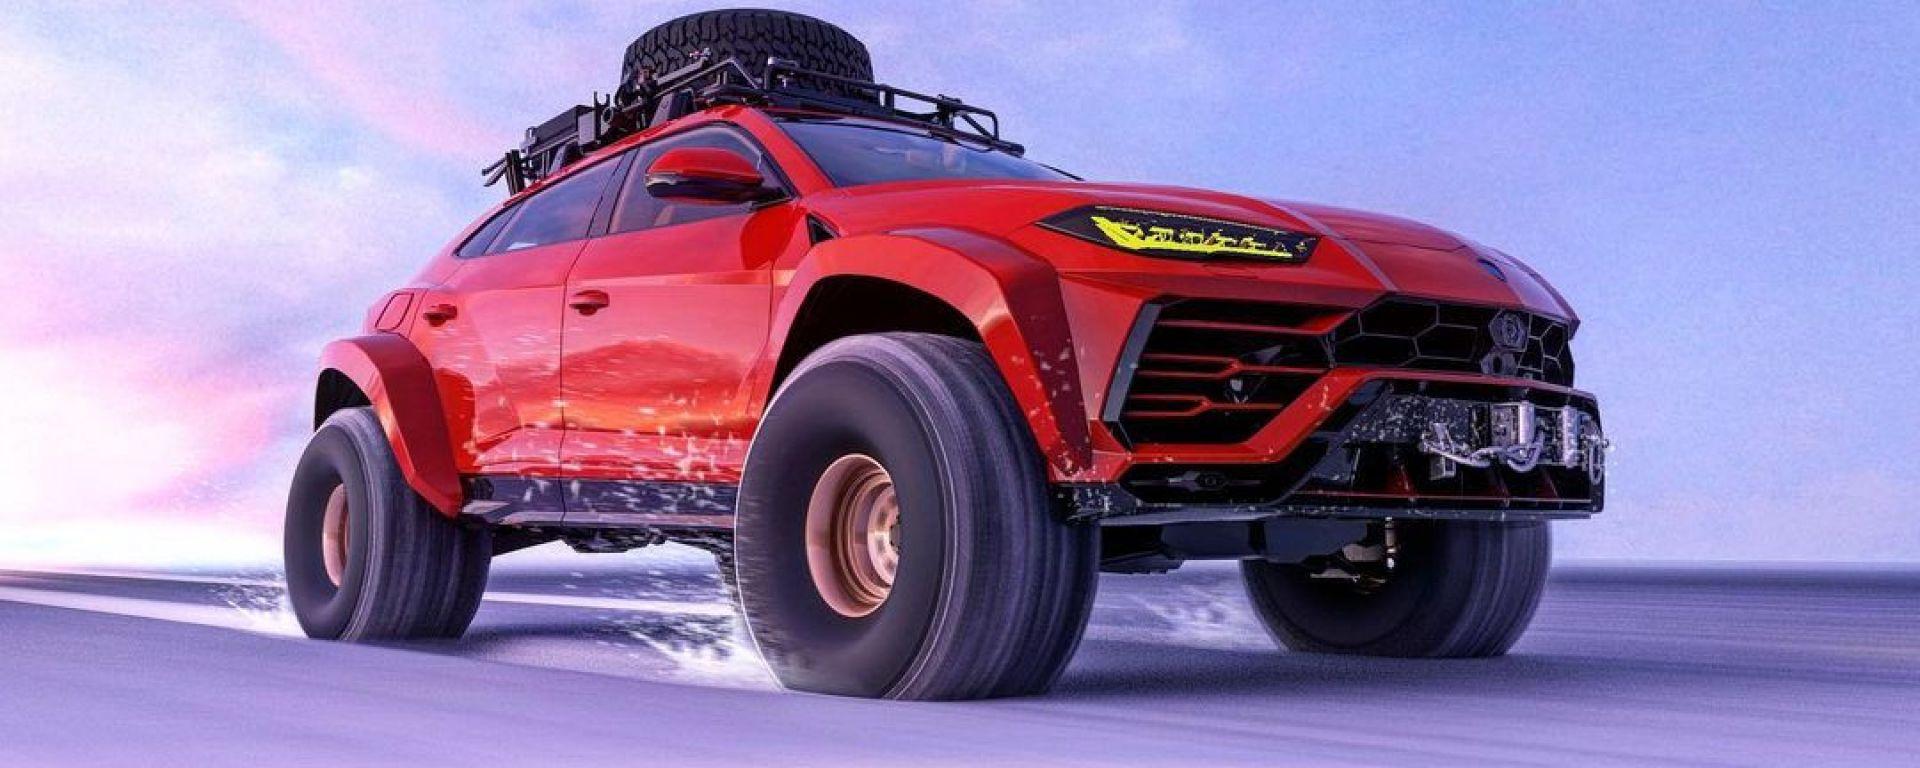 Lamborghini Urus delle nevi nel rendering di Abimelec Design